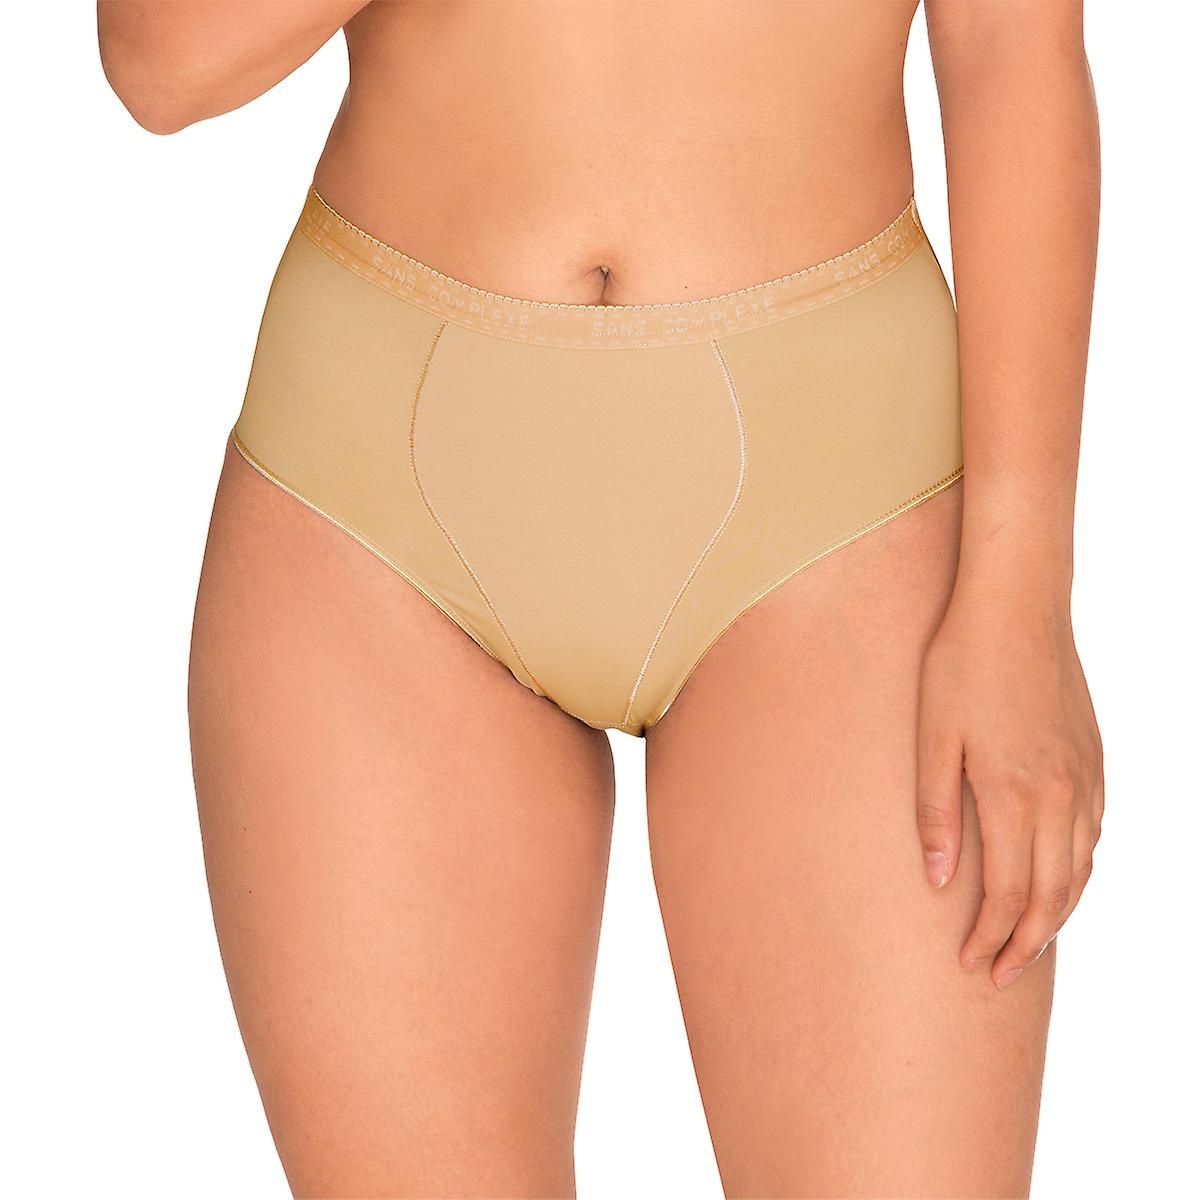 Singles for light skin women in underwear movie news and